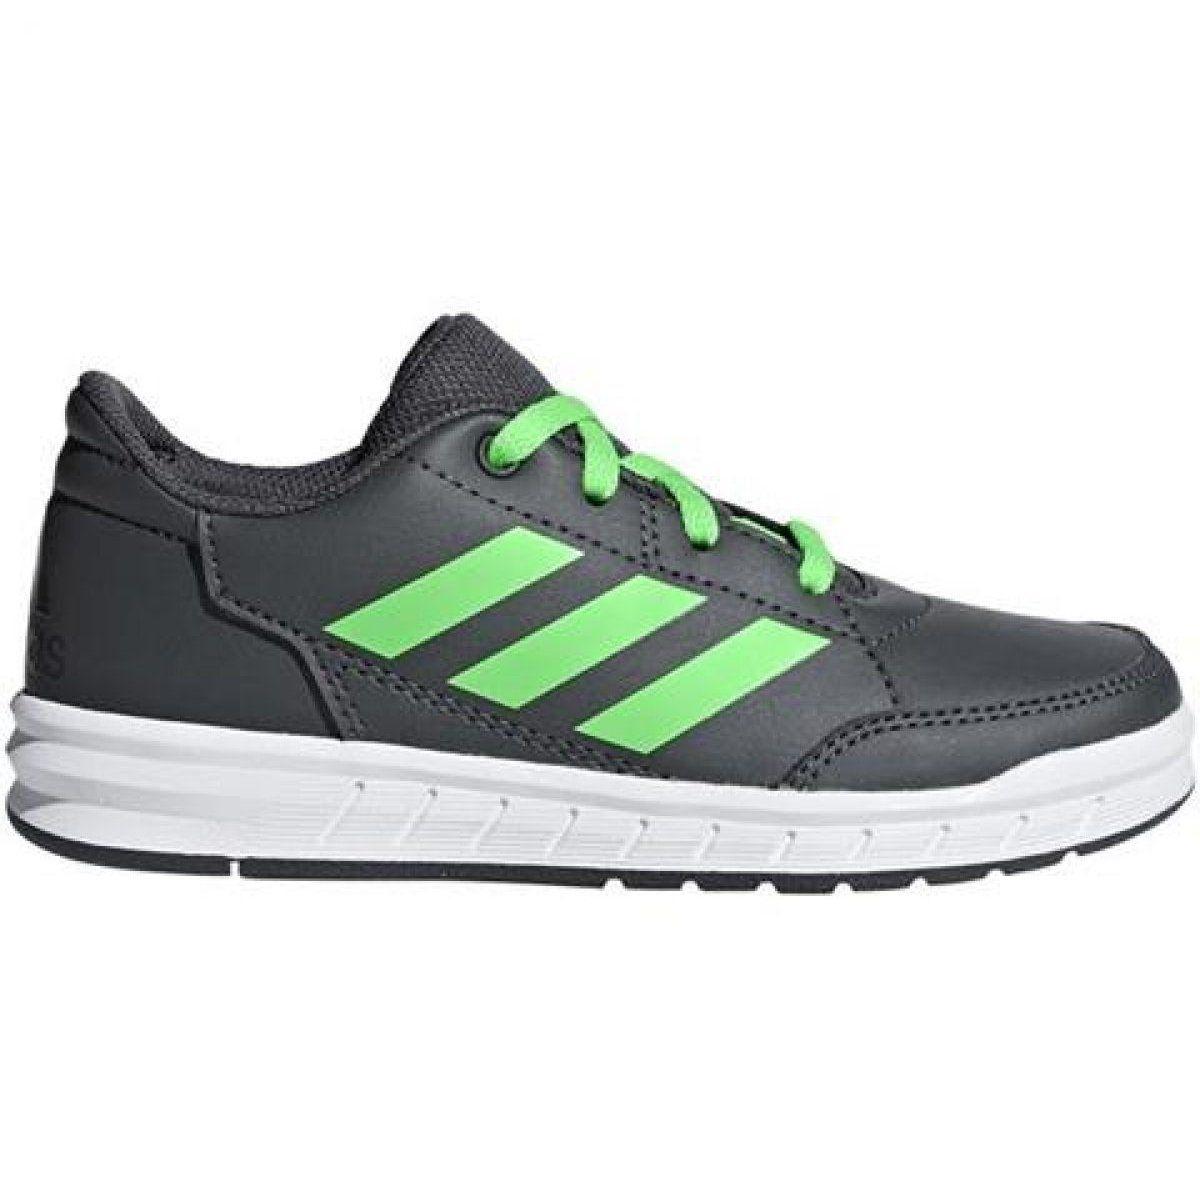 Buty Adidas Altasport Jr D96868 Szare Zielone Adidas Sports Shoes Adidas Shoes